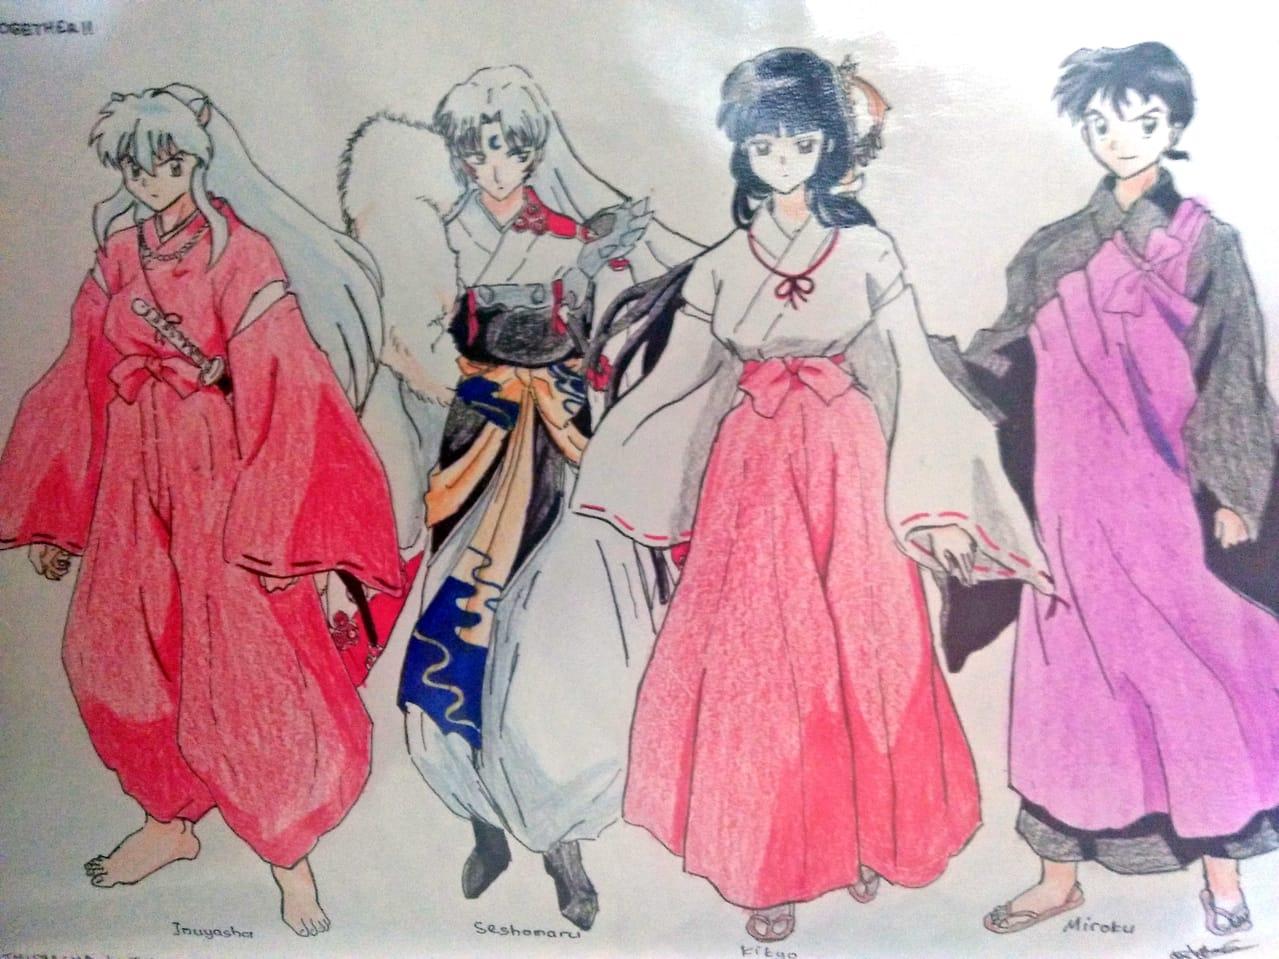 Inuyasha-Seshomaru-Kikyo-Miroku Illust of fx1ndr46 AnalogDrawing Inuyasha fanart fx16 Kikyo animemanga drawing fx1ndr46 Seshomaru miroku